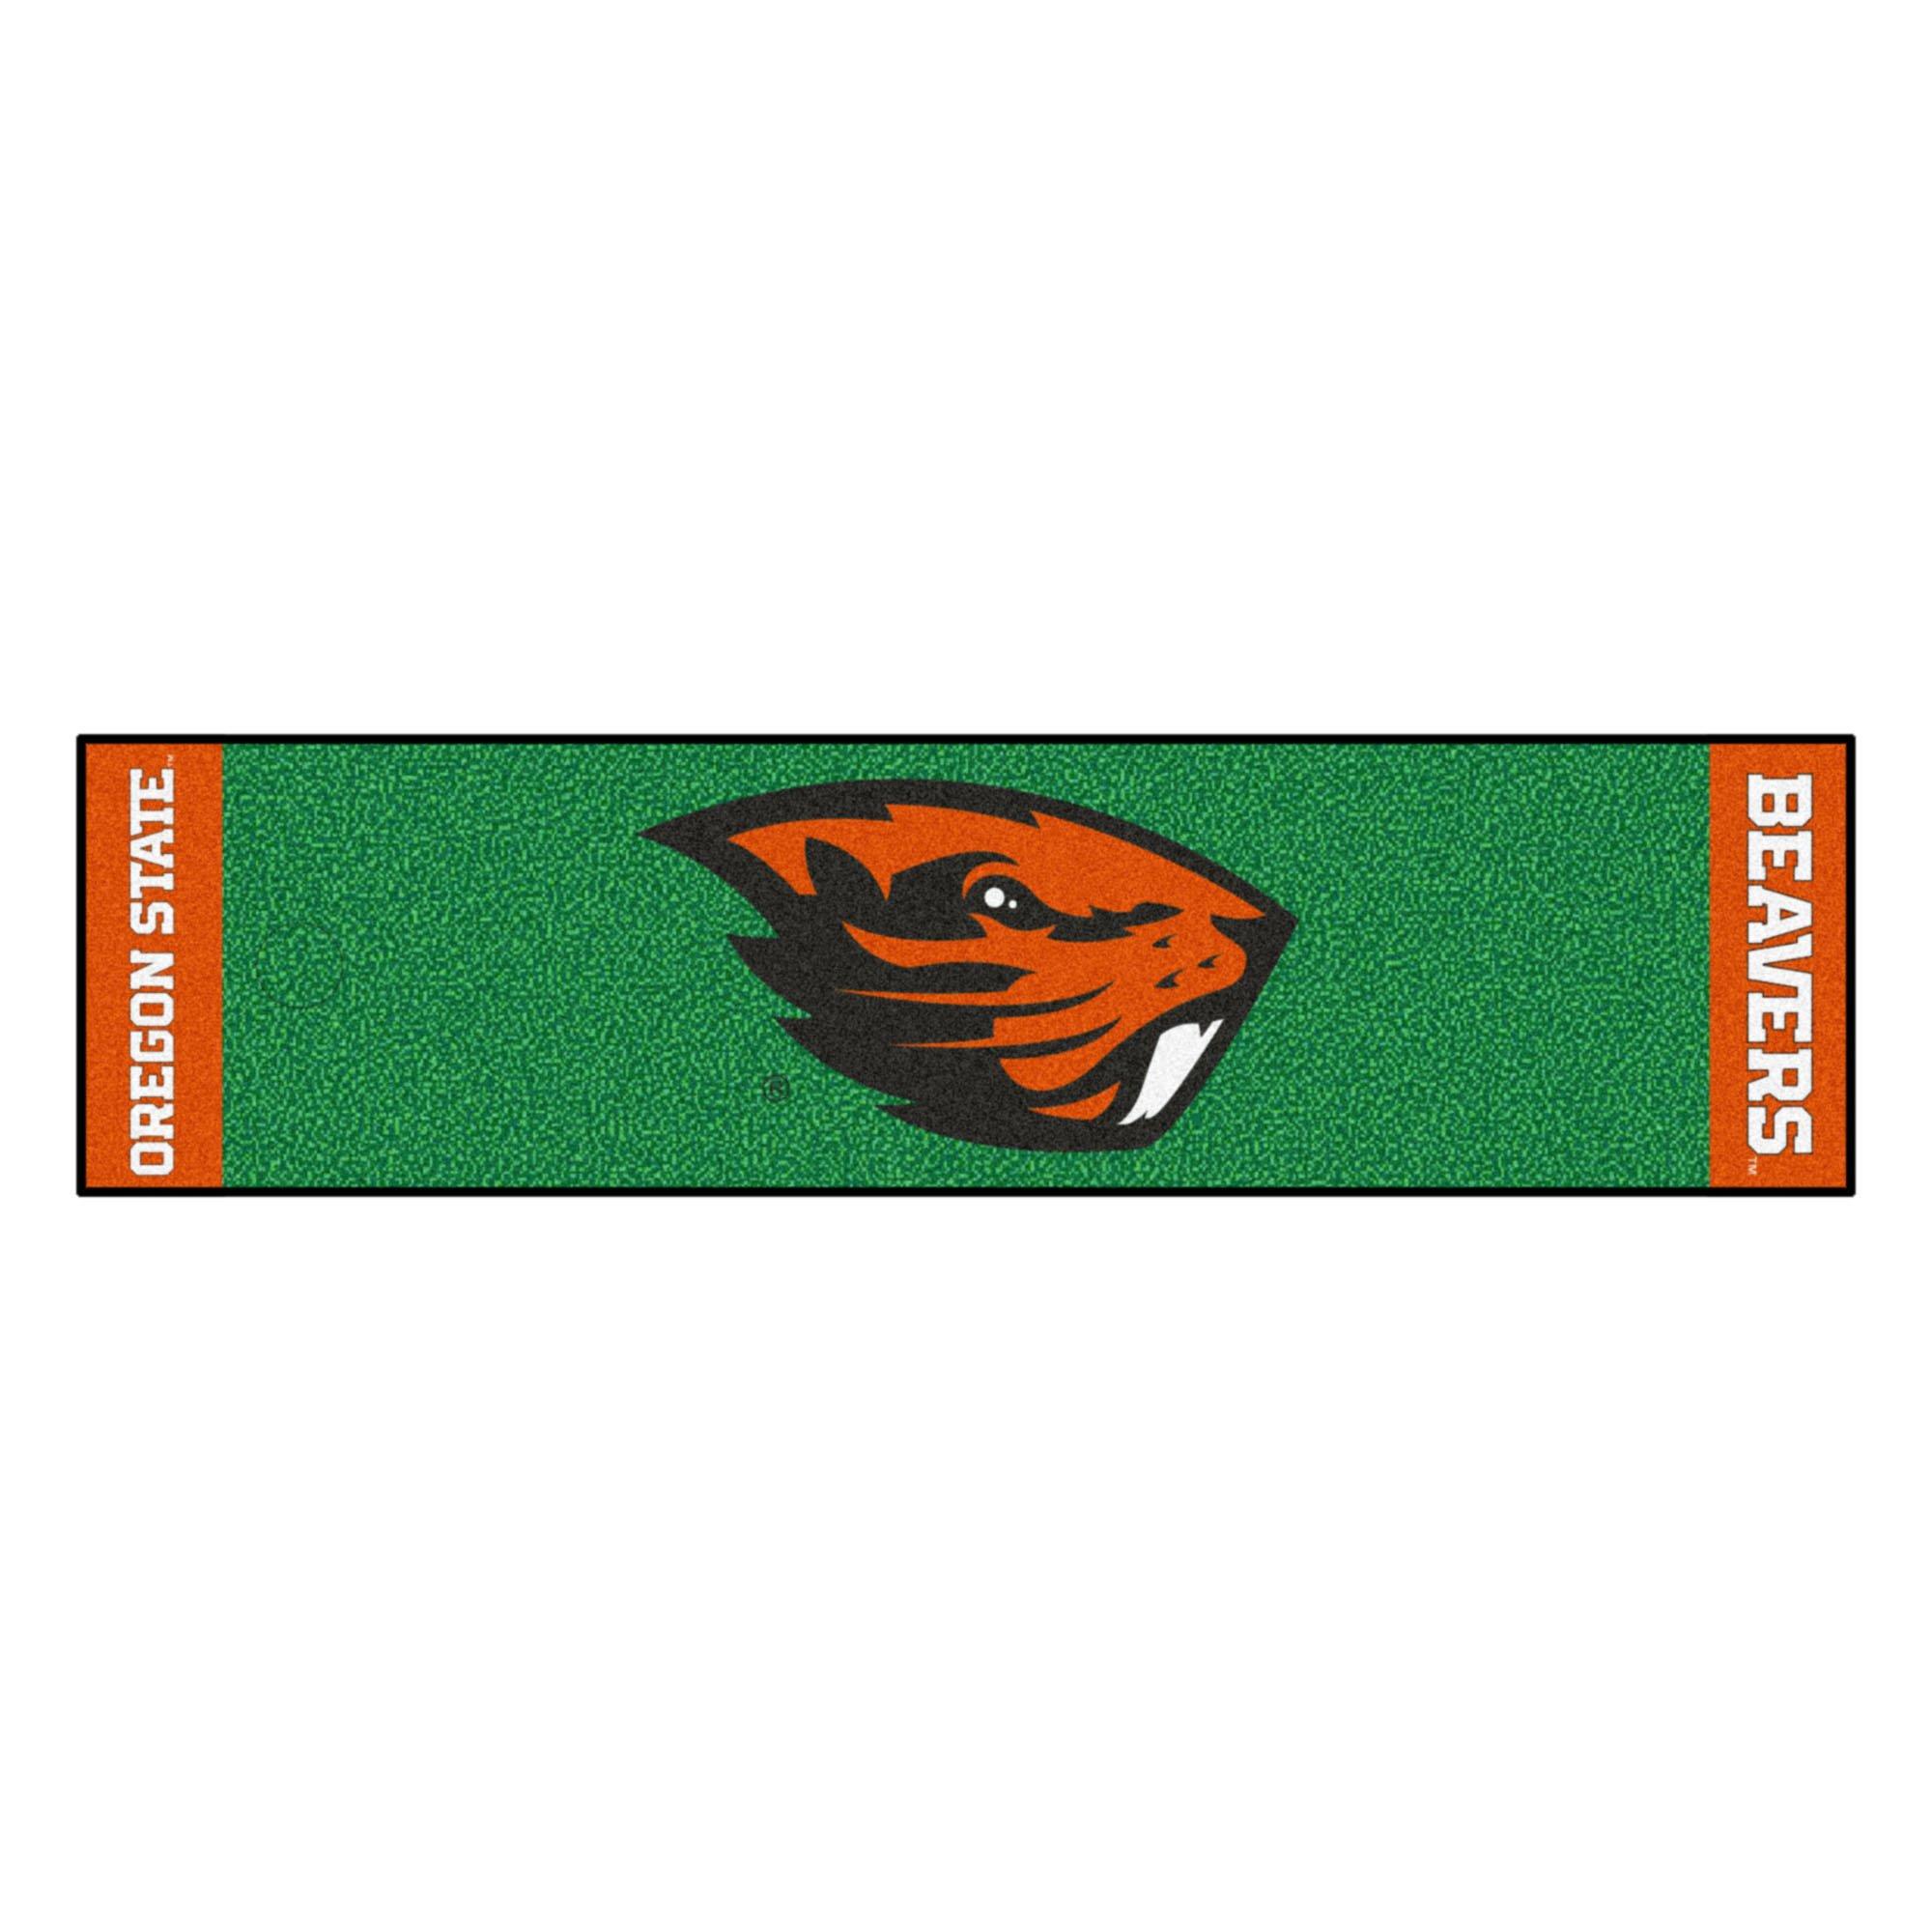 NCAA Oregon State University Beavers Putting Green Mat Golf Accessory